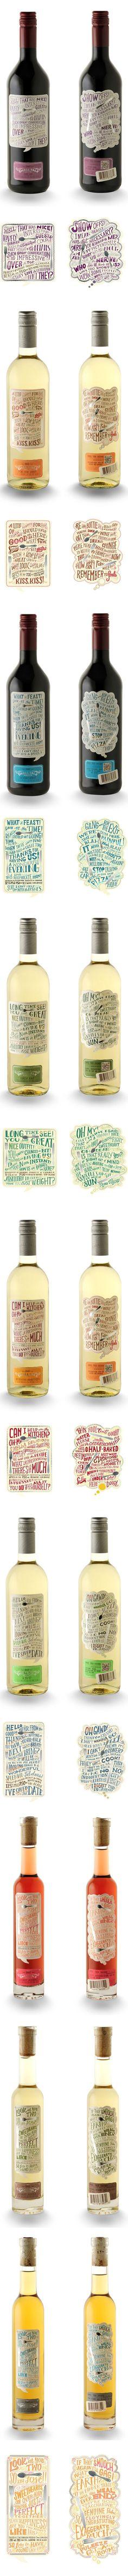 Small Talk Wine by Brandever